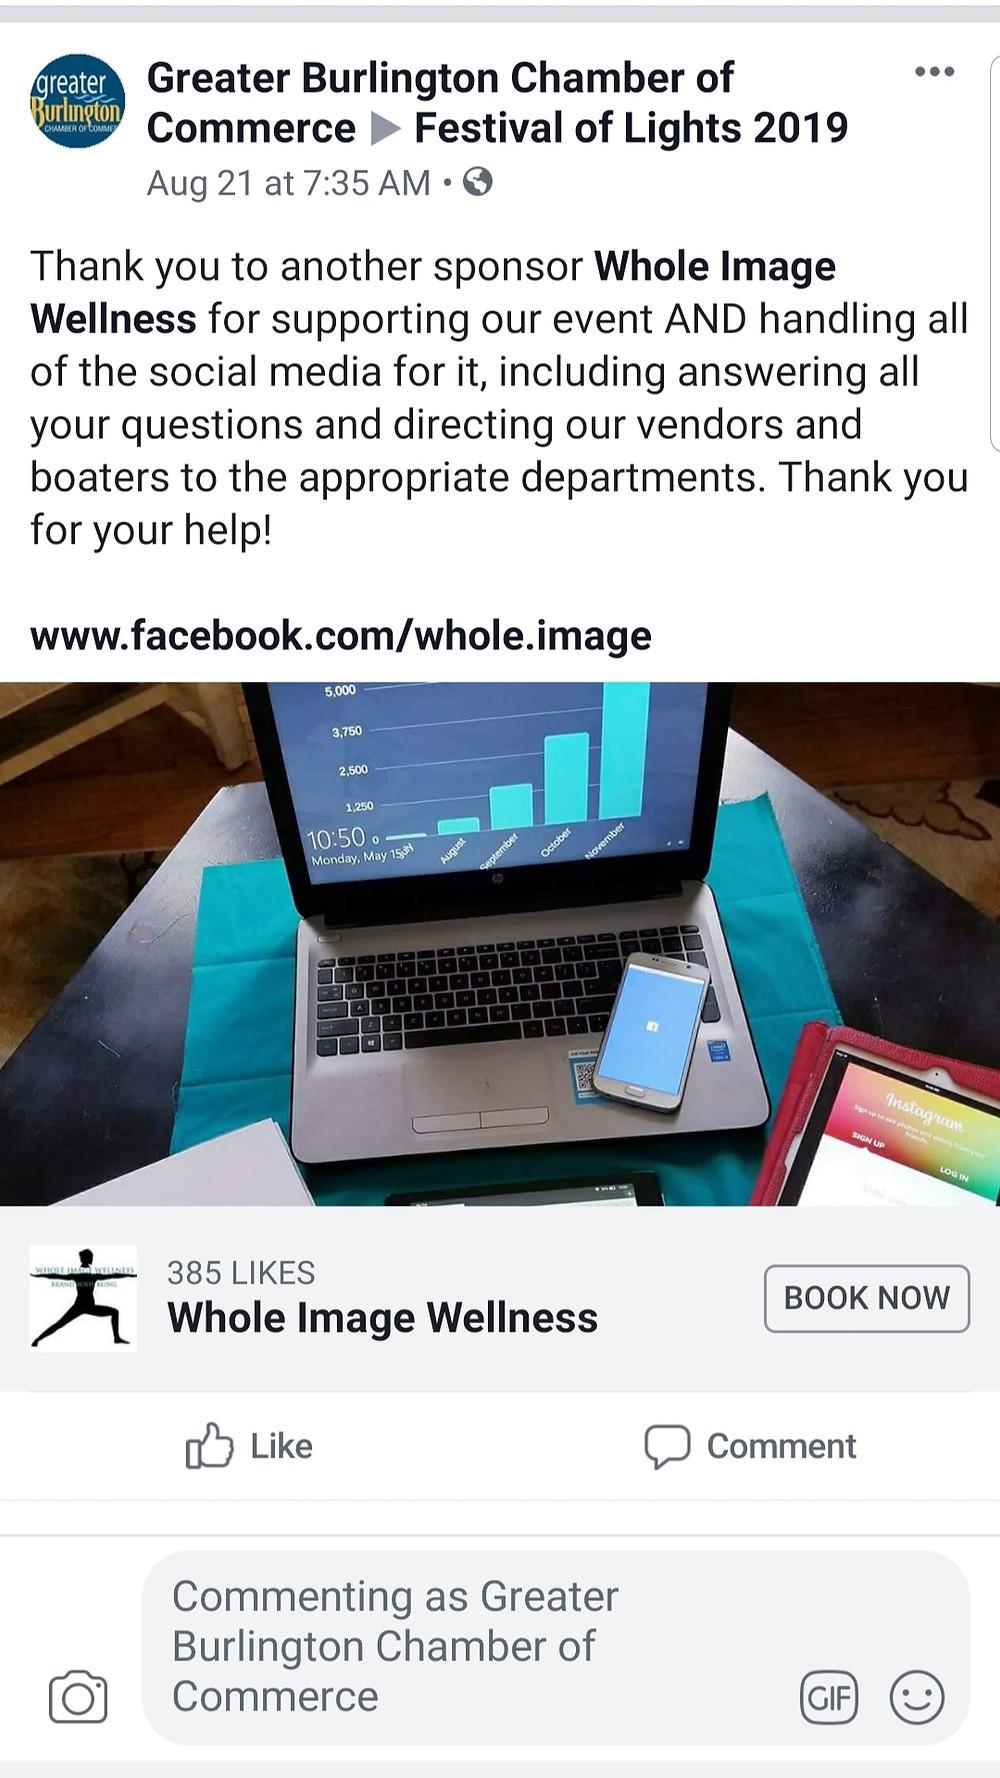 Whole Image Wellness